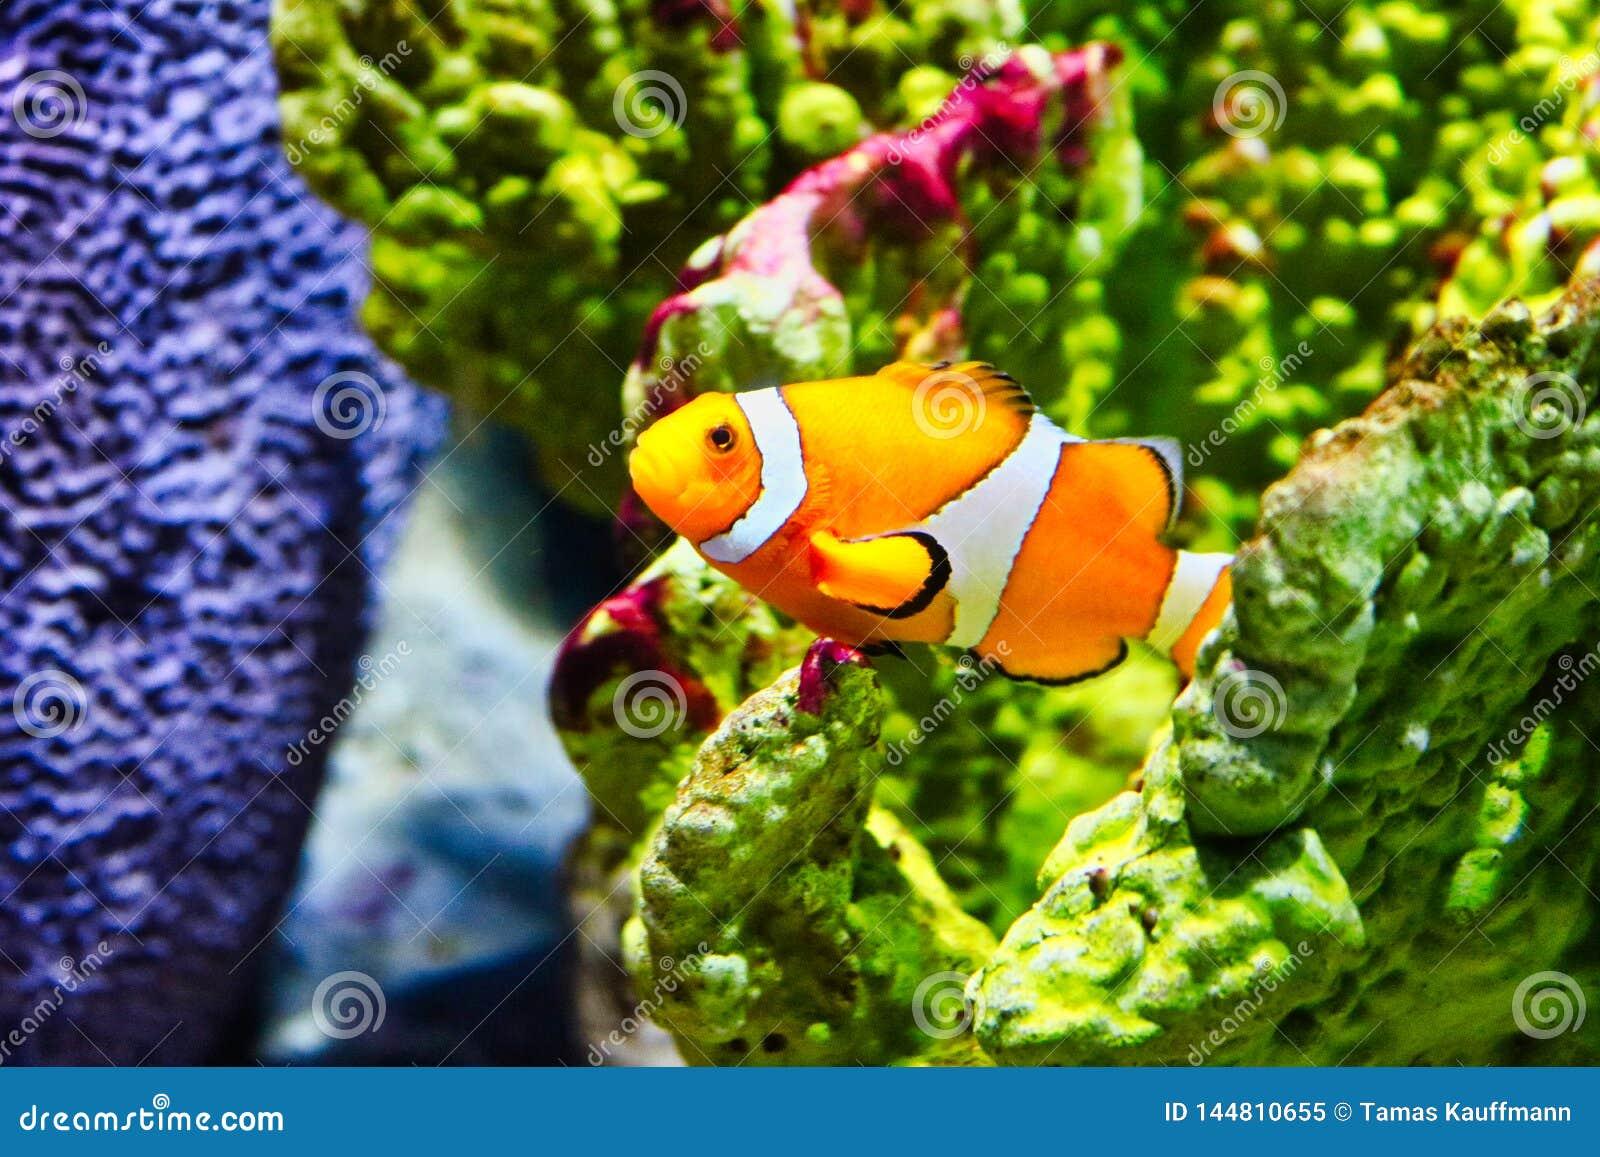 Clownfish in The Sea life aquarium in Bangkok